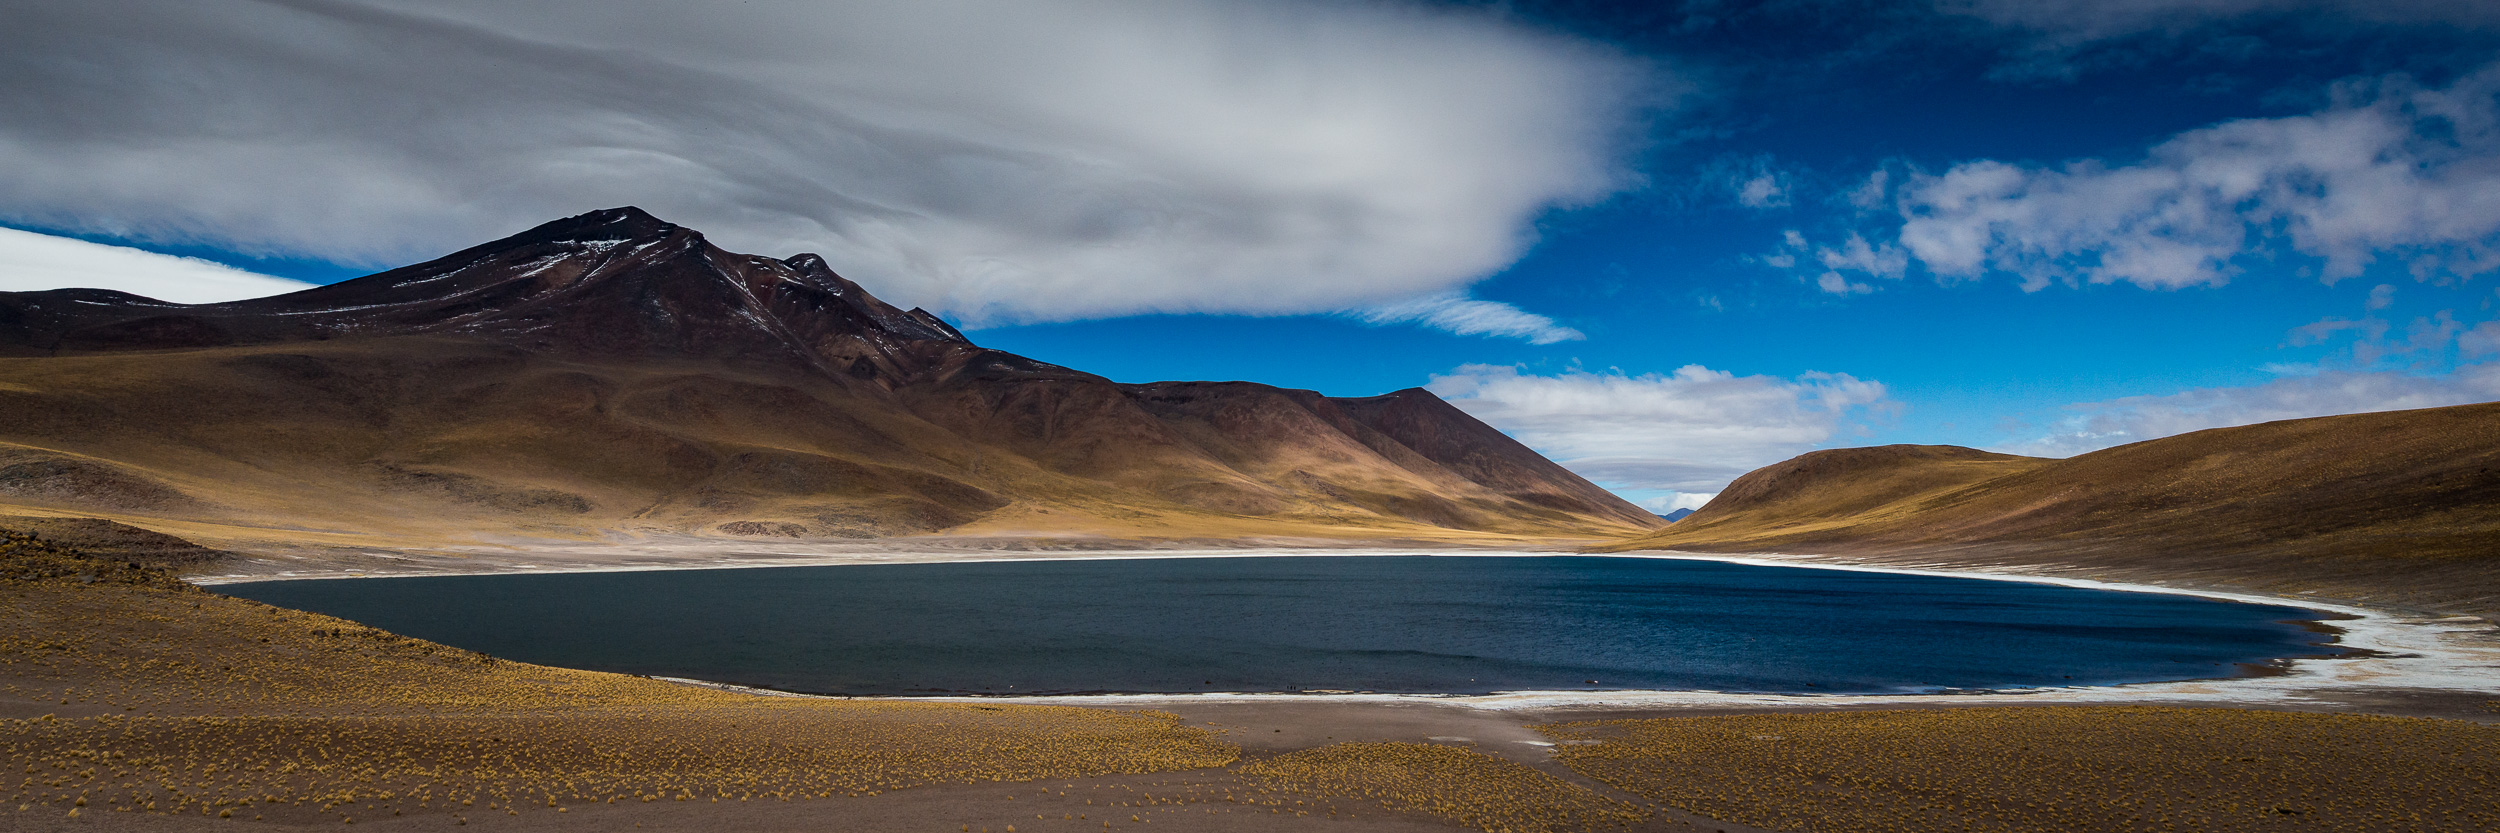 chile - 4158 m